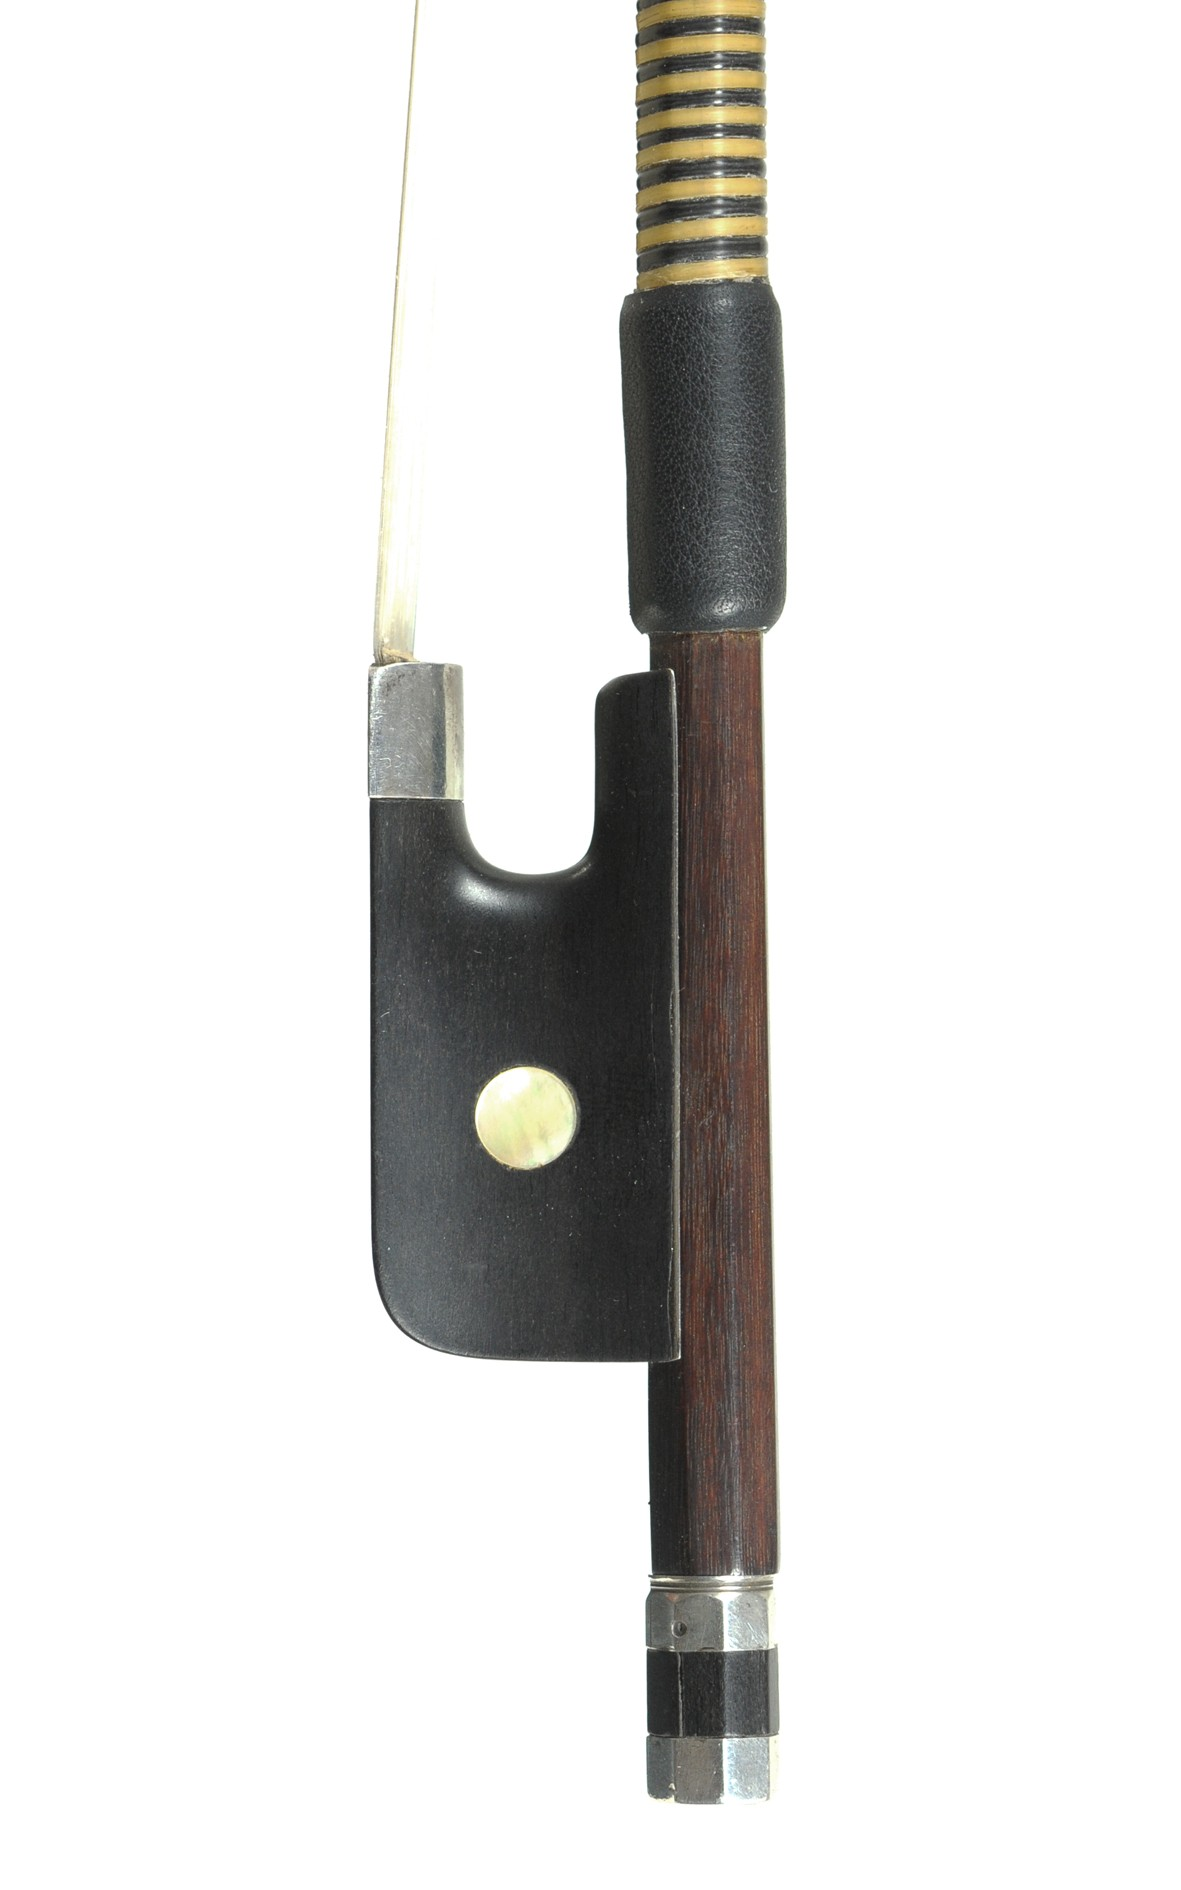 Fine cello bow, lightweight